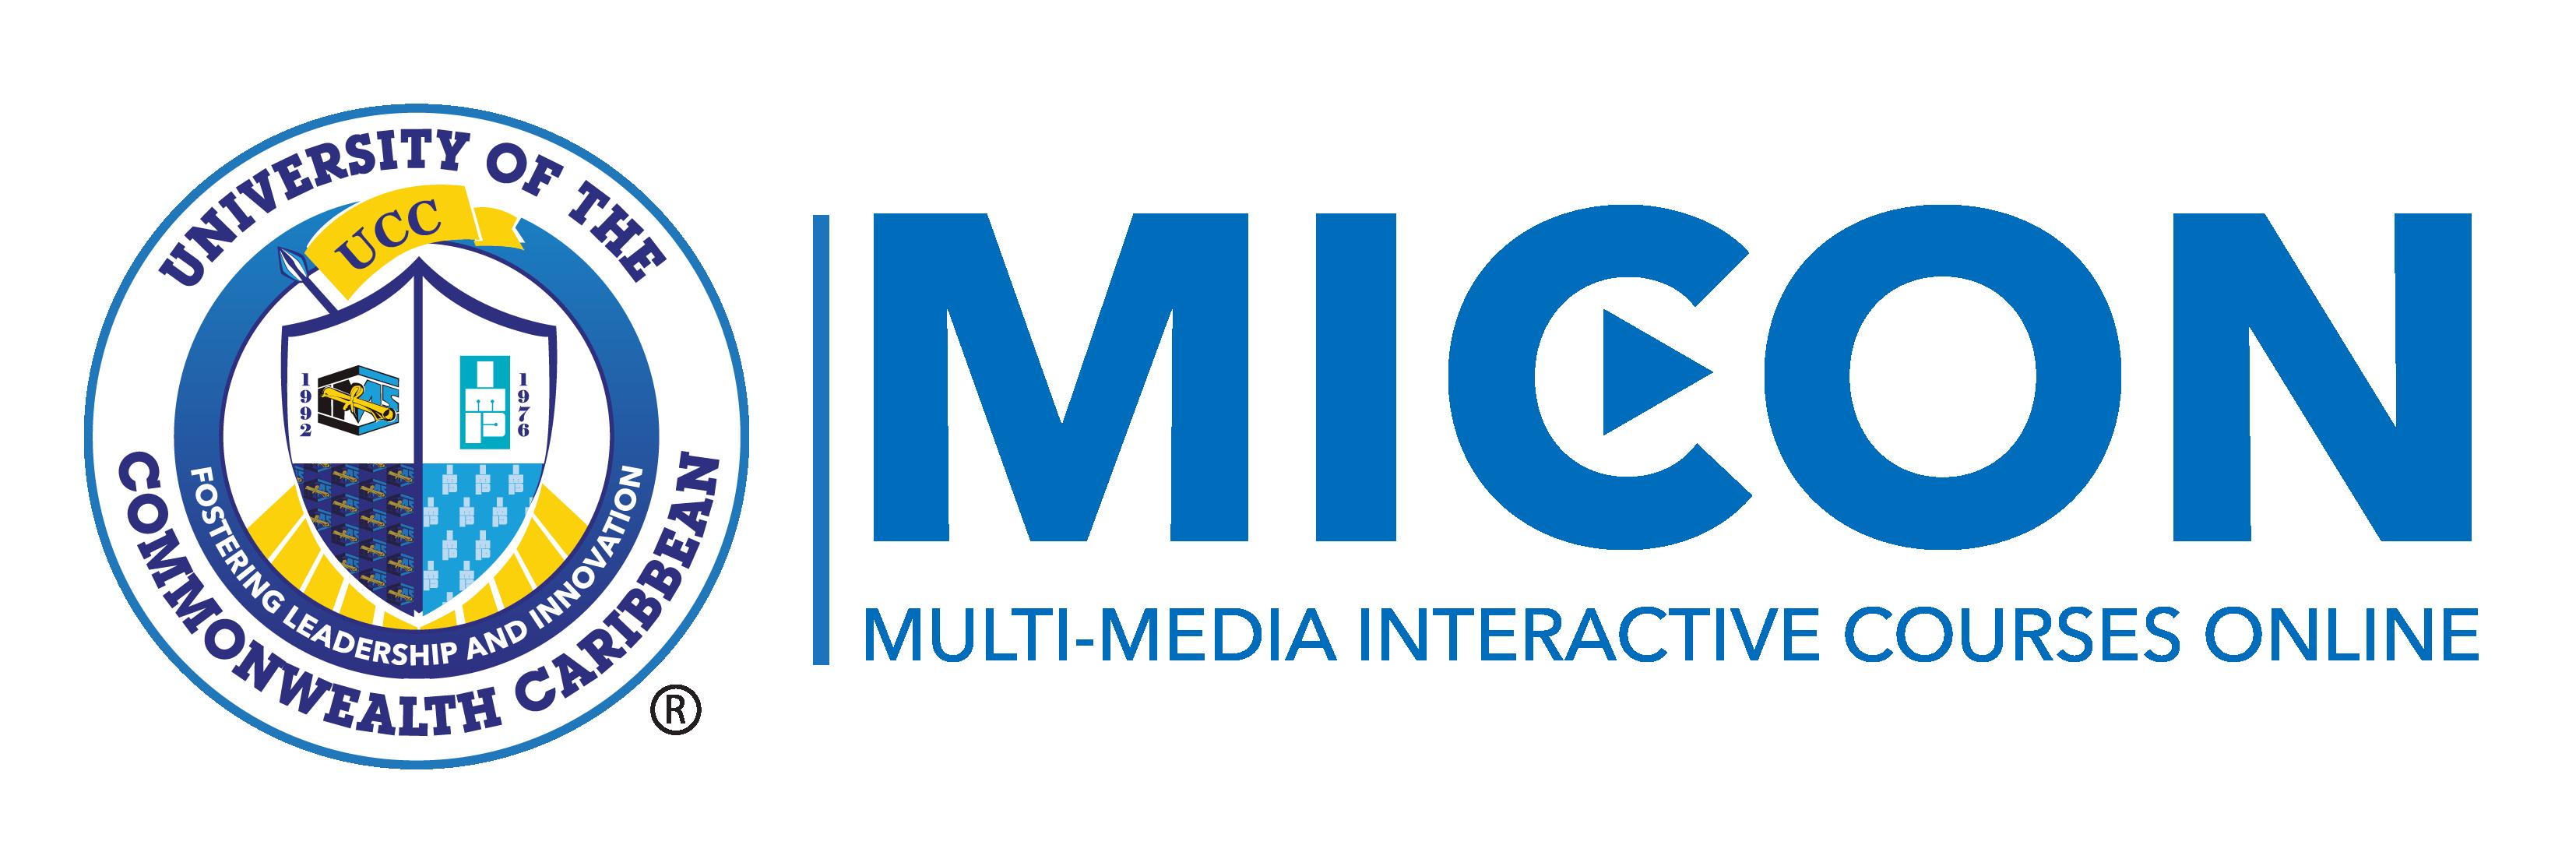 Multimedia Interactive Courses Online - Caribbean MOOC